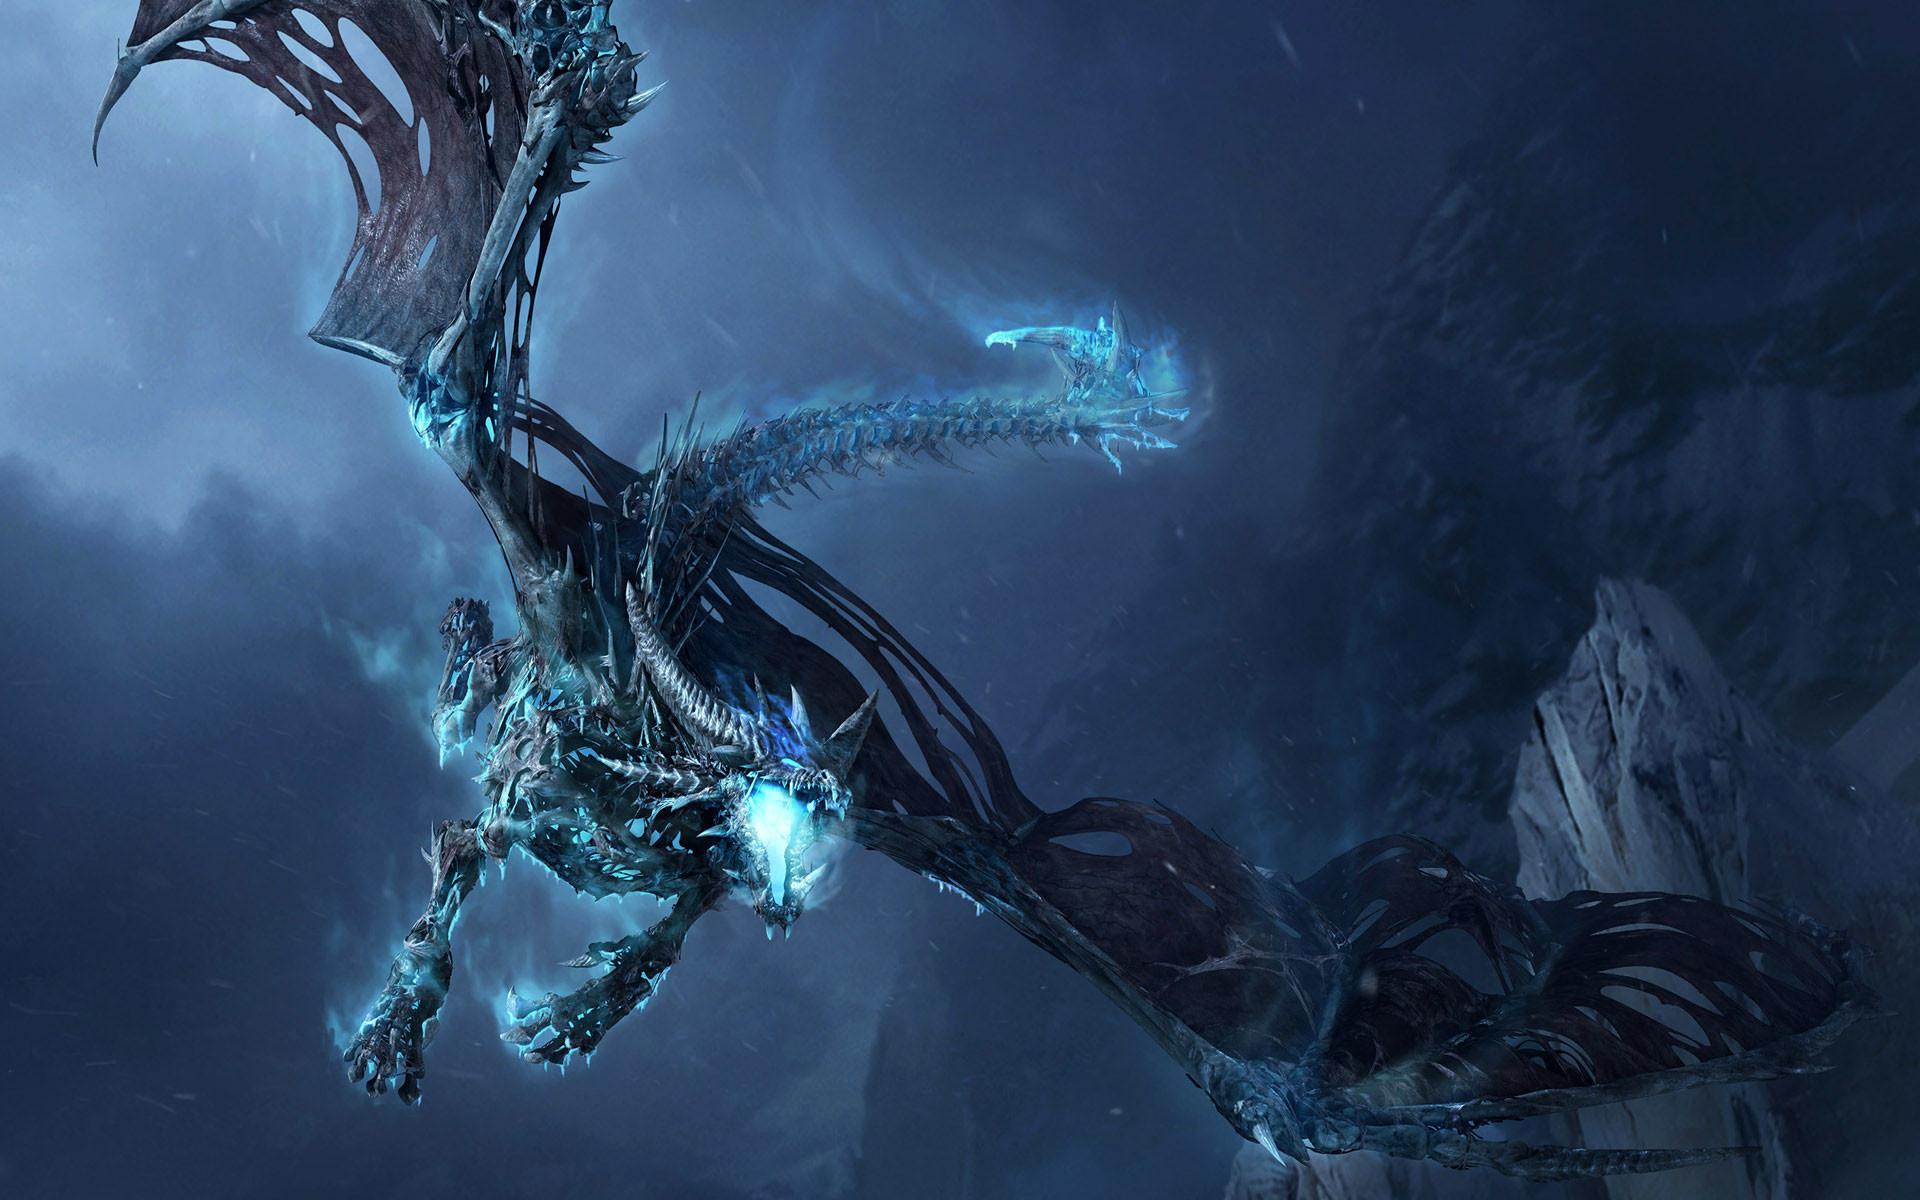 Frost-Dragon-Widescreen-Wallpaper